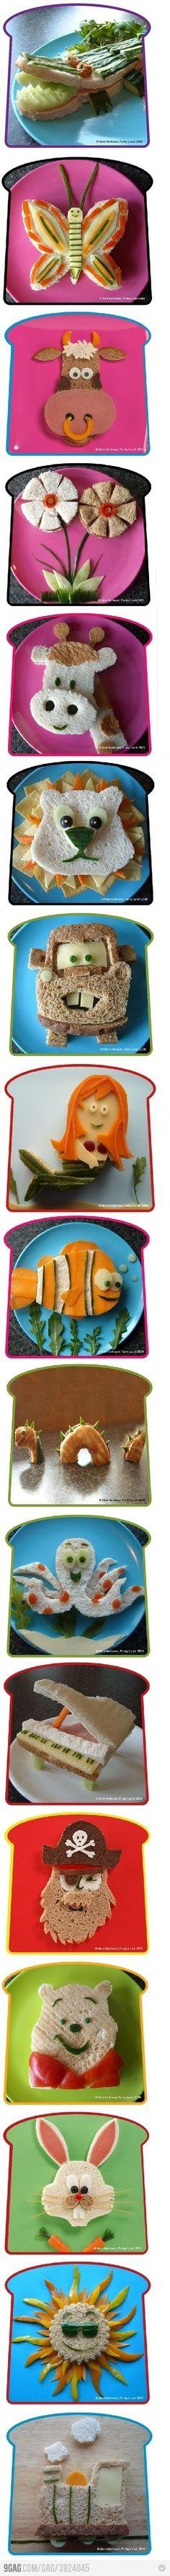 #lunch #nutrition #healthy #kids #children #school #escuela #nutritivo #creative